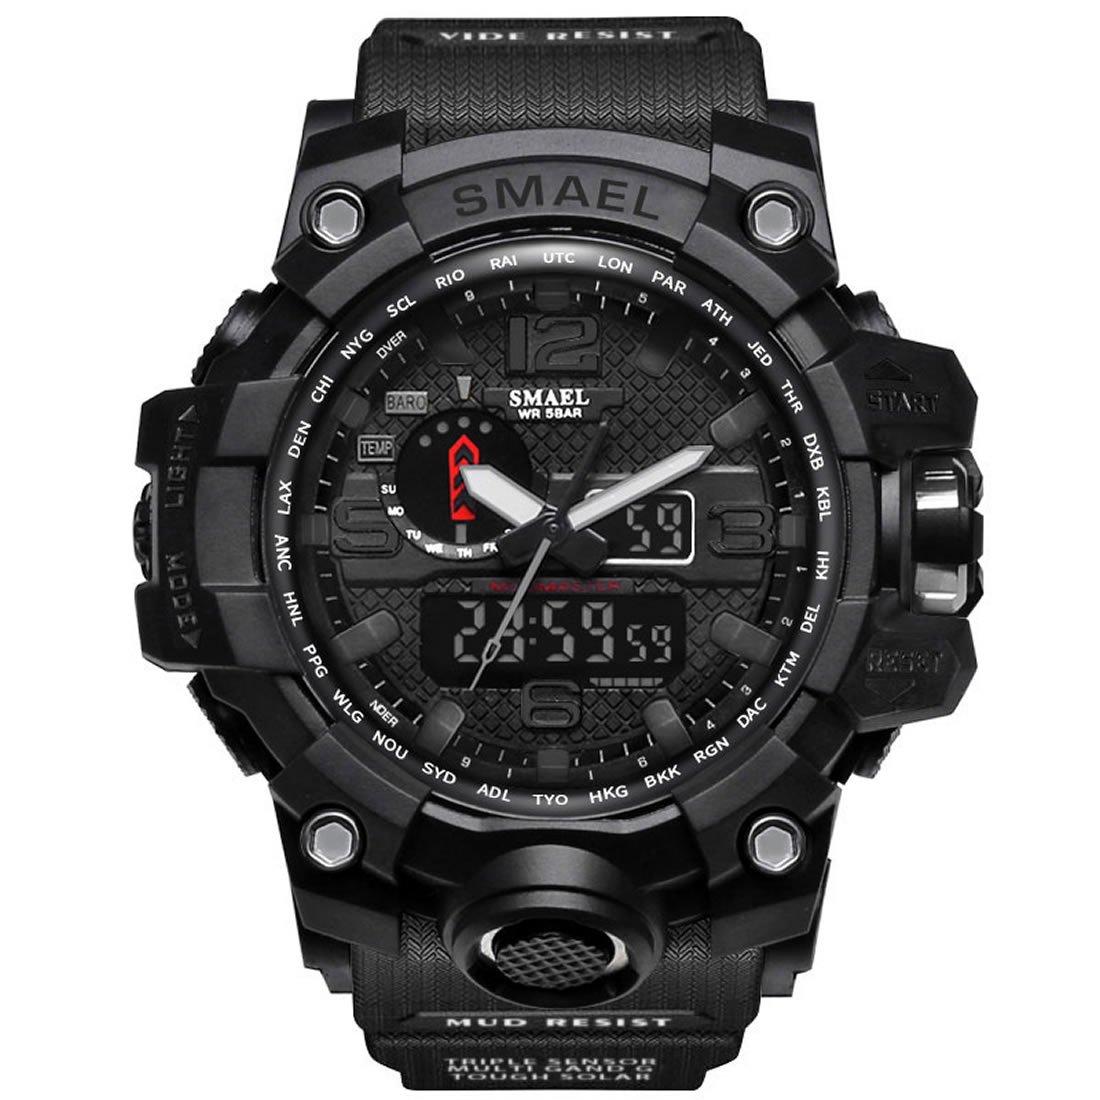 Men's Military Waterproof Digital-Analog Display Sport Watches Multifunctional Wrist Watches for Men (Black)